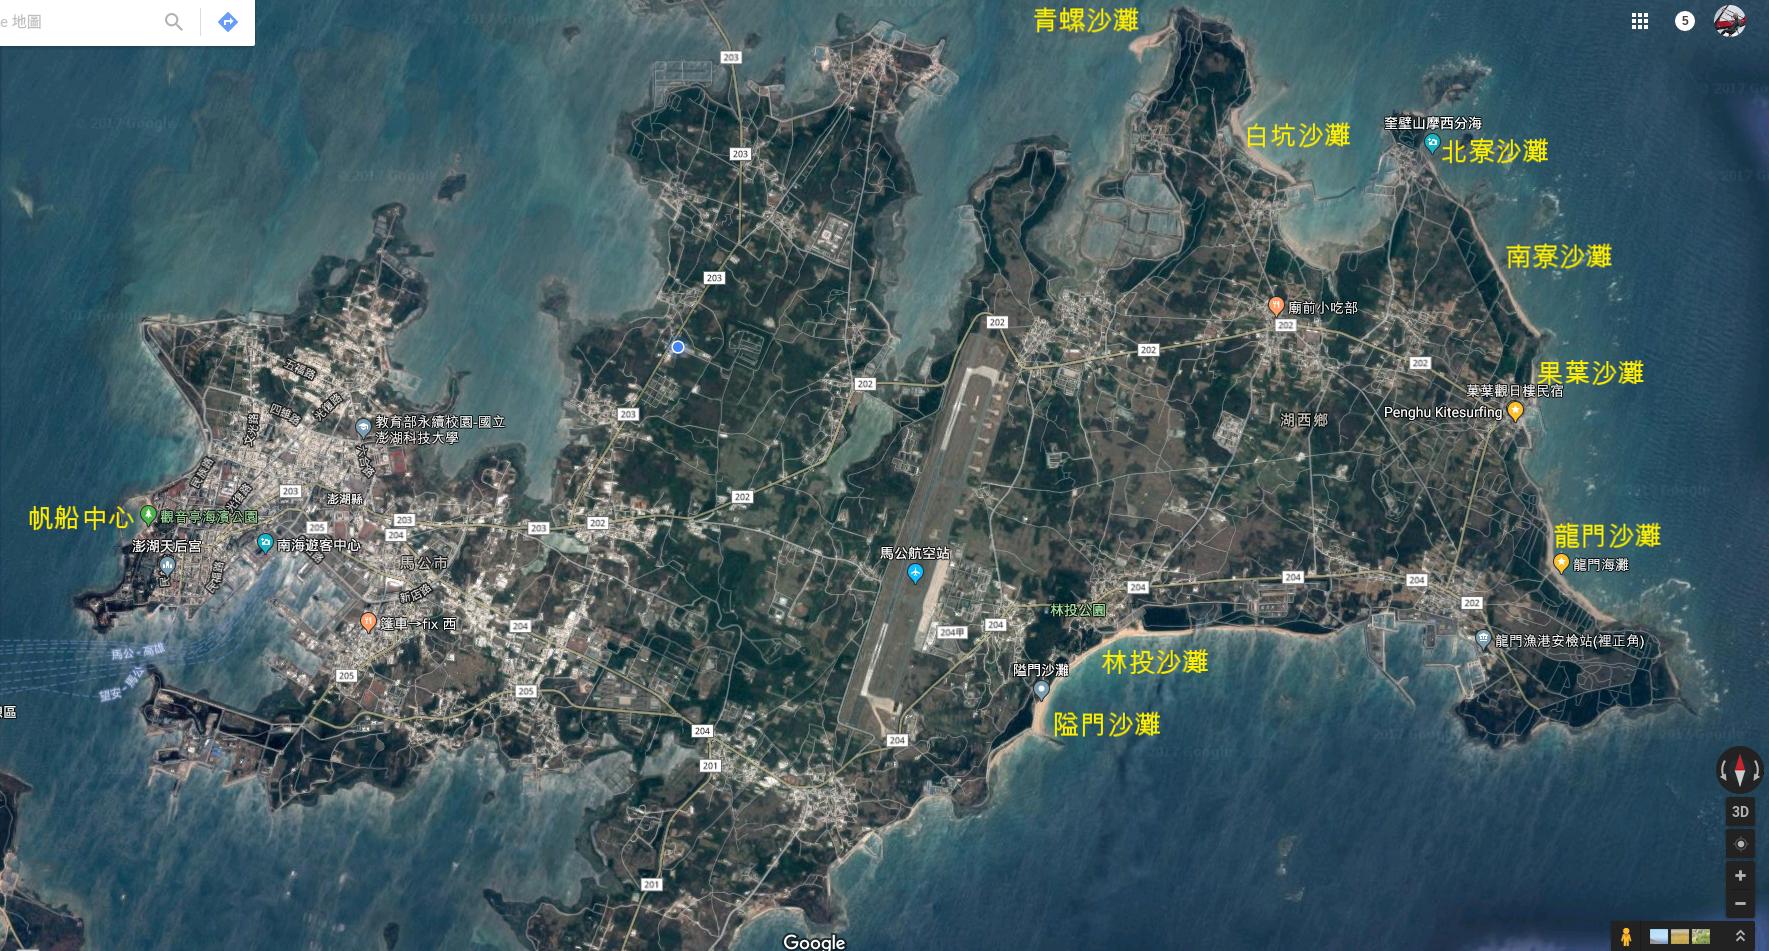 FireShot Capture 065 - Google 地圖_ - https___www.google.com_maps_@23.57.png